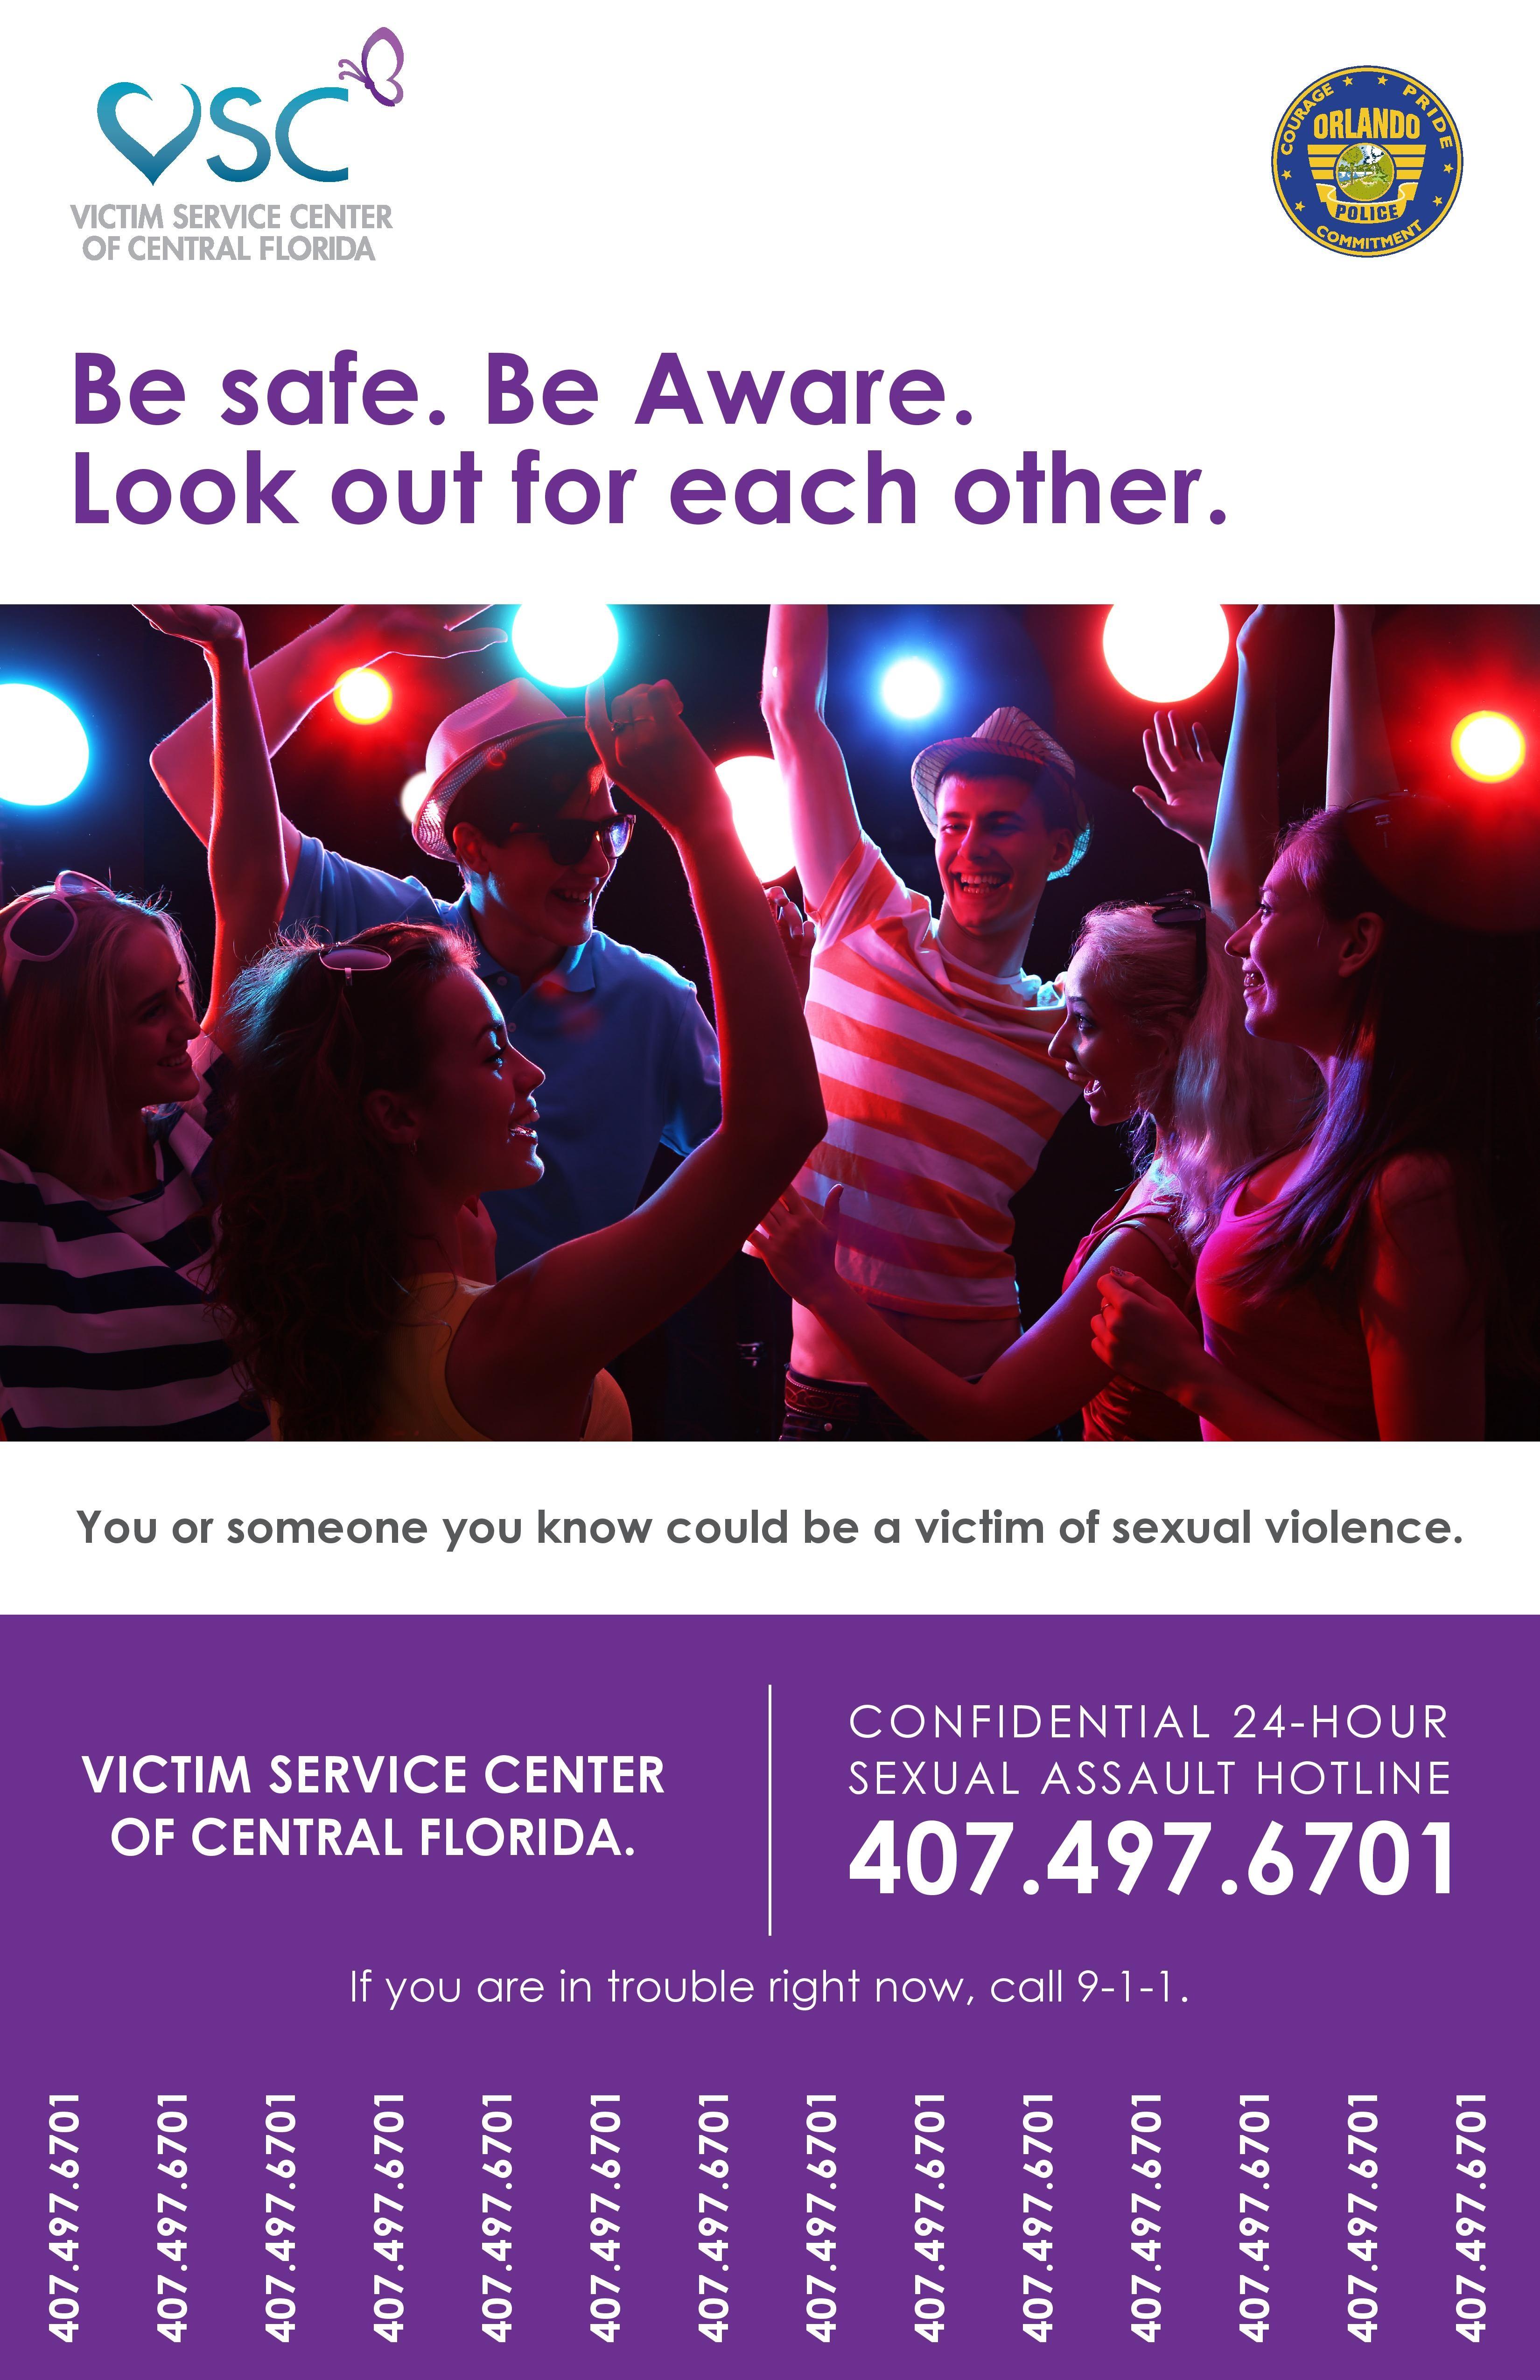 Poster via Orlando Police Department